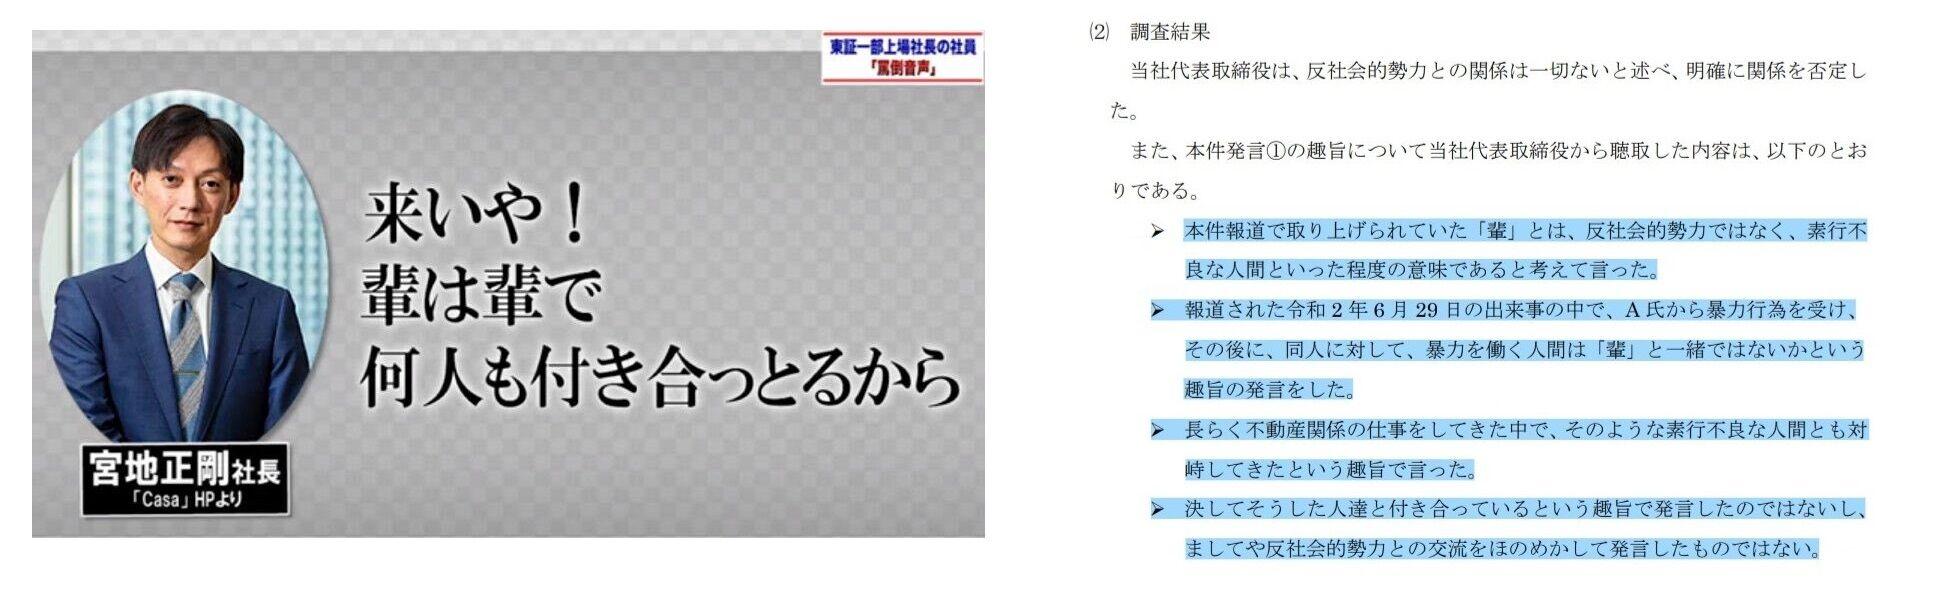 https://livedoor.blogimg.jp/masorira-kabu/imgs/2/c/2c60e4da.jpg